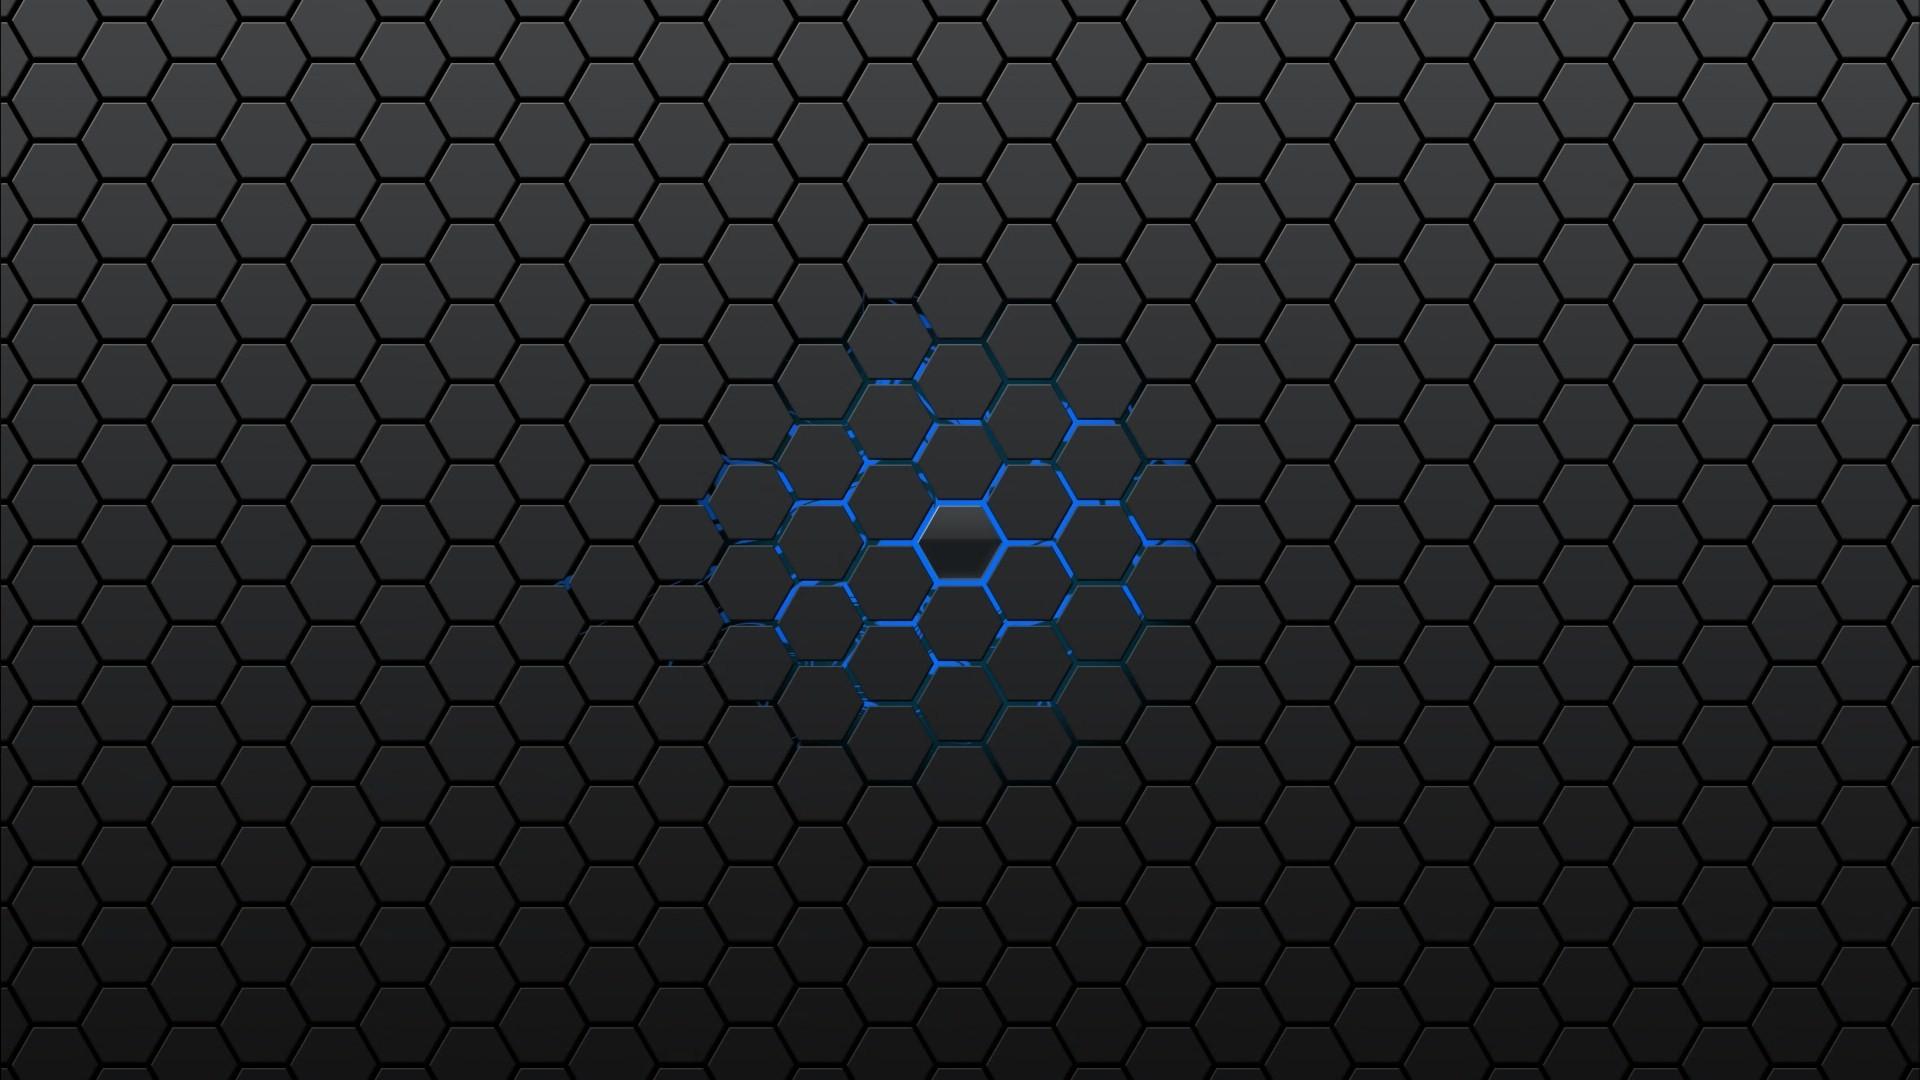 Abstract pattern hd black wallpaper wallpaper | | 196178 .